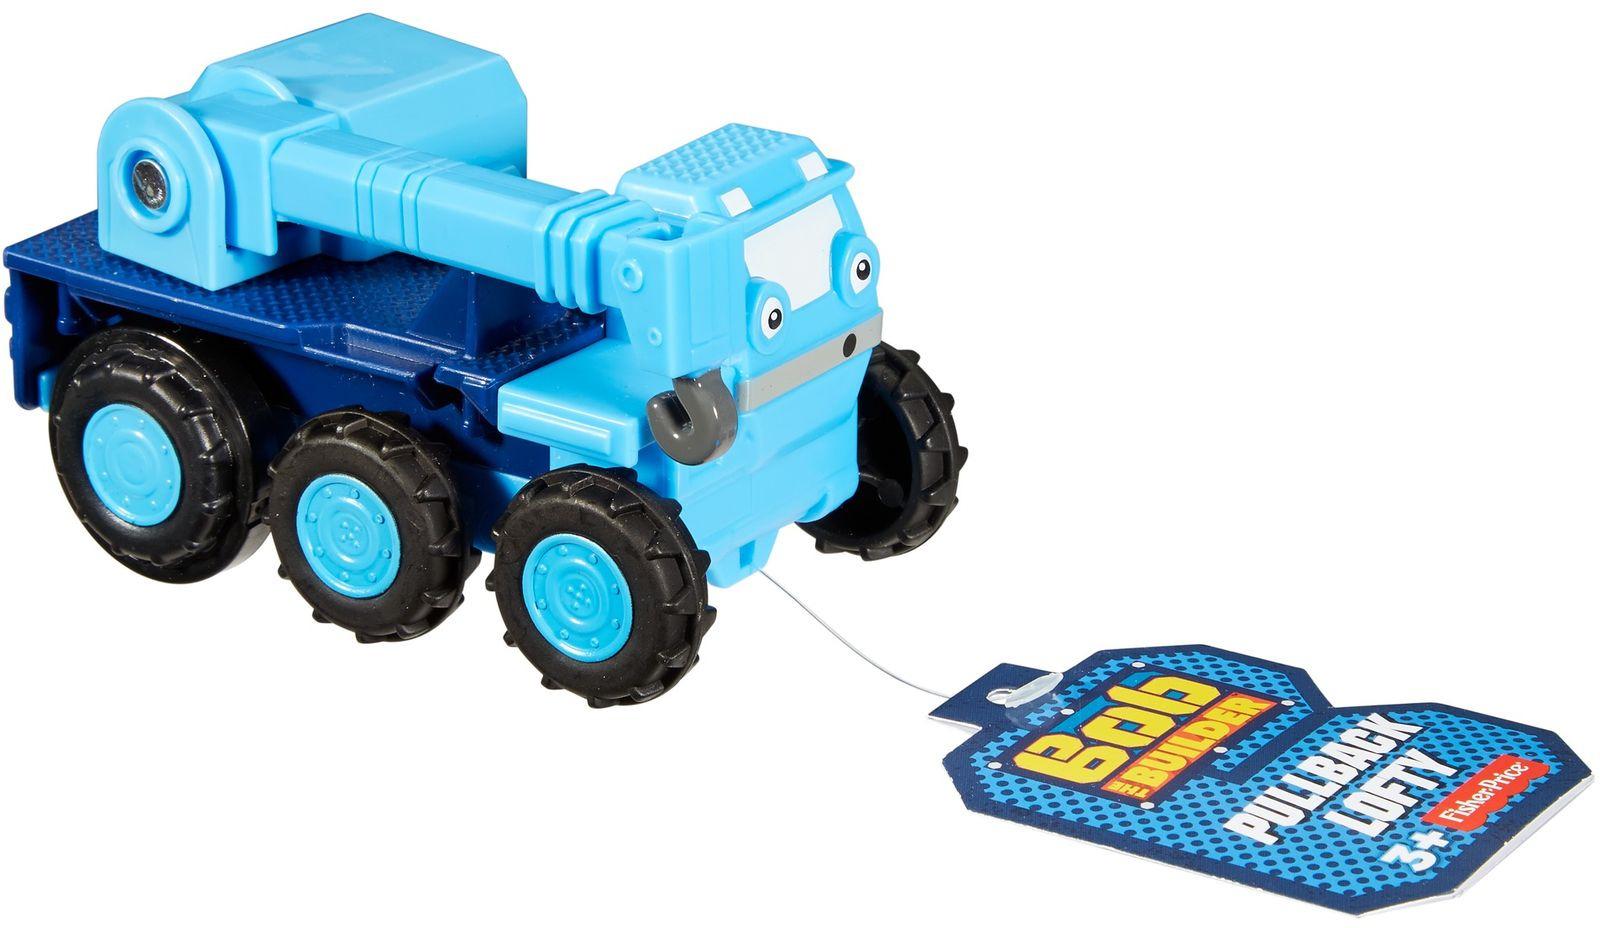 Bob the Builder Машинка инерционная цвет синий bob the builder машинка инерционная цвет синий